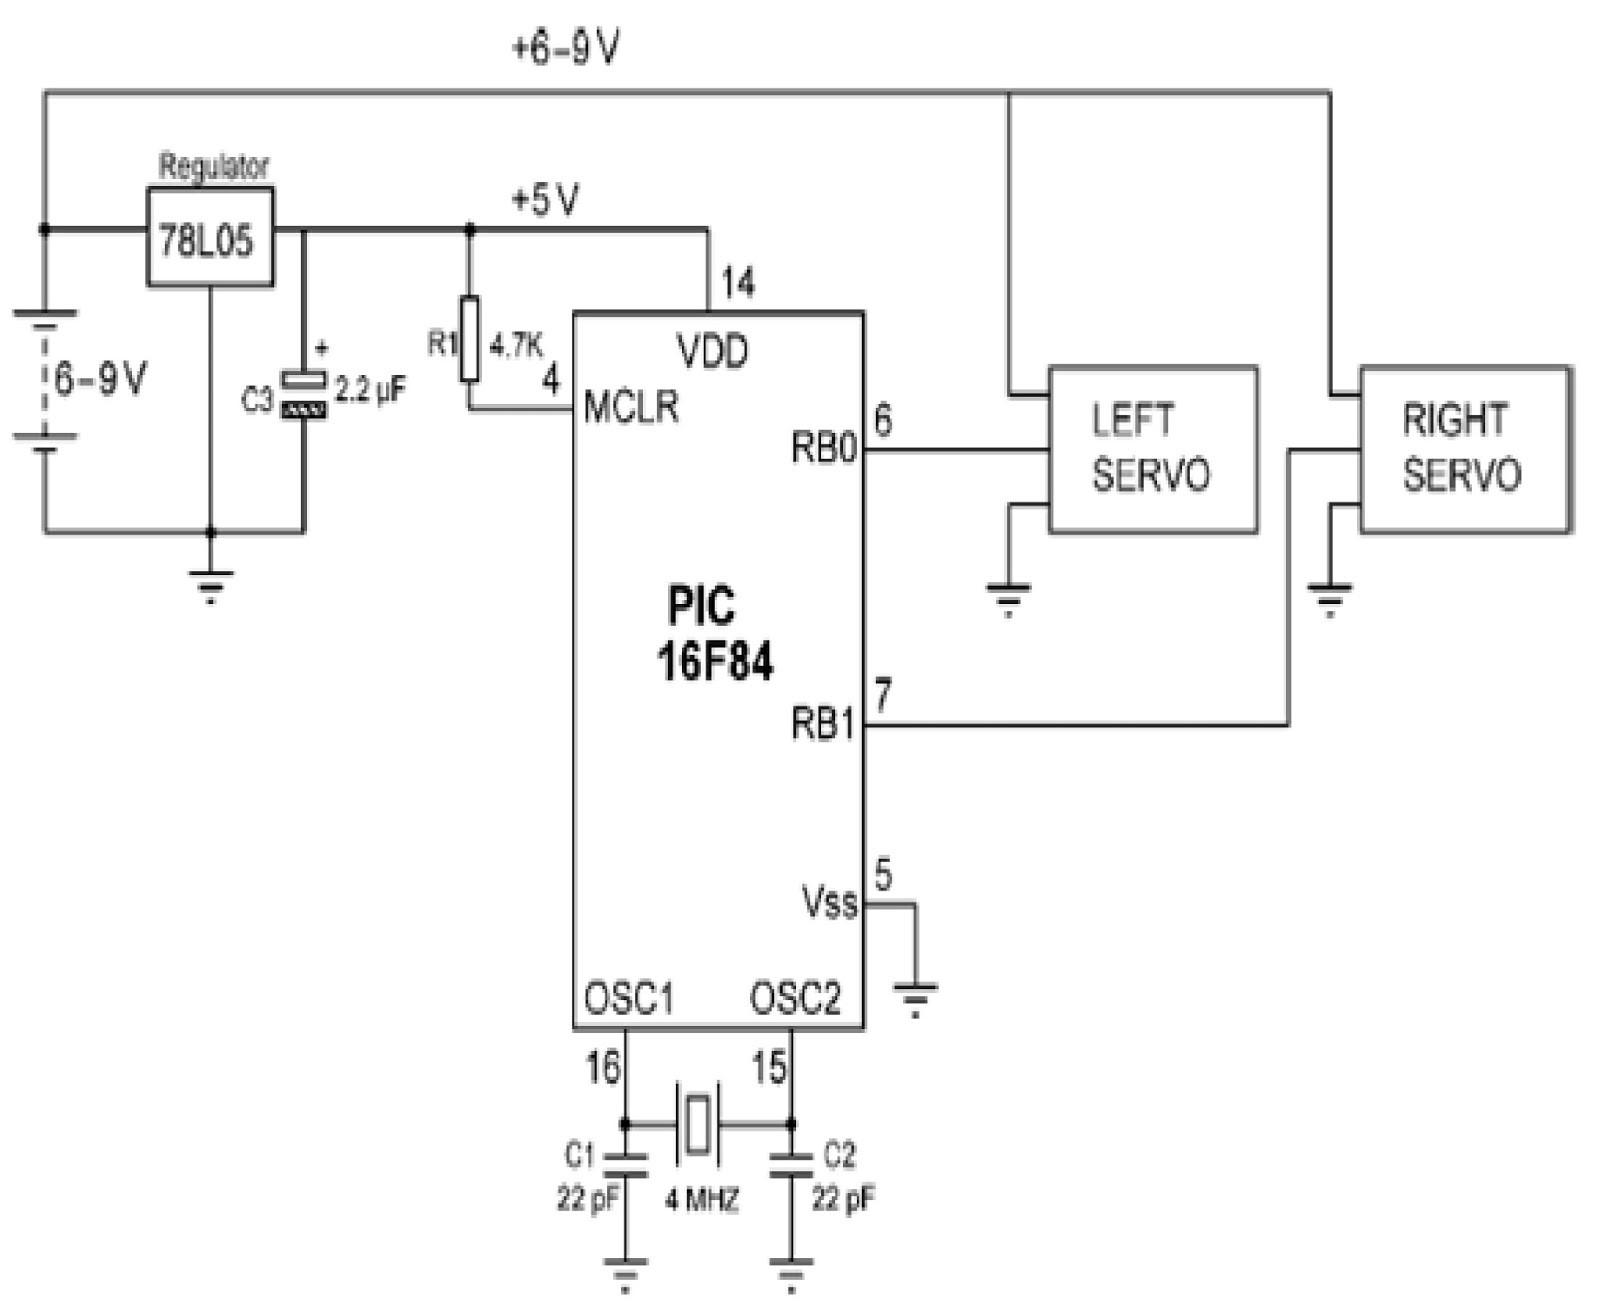 Servo Motor Wiring Diagram 2019 Lichuan 1kw 4nm Ac Servo Kit ... on